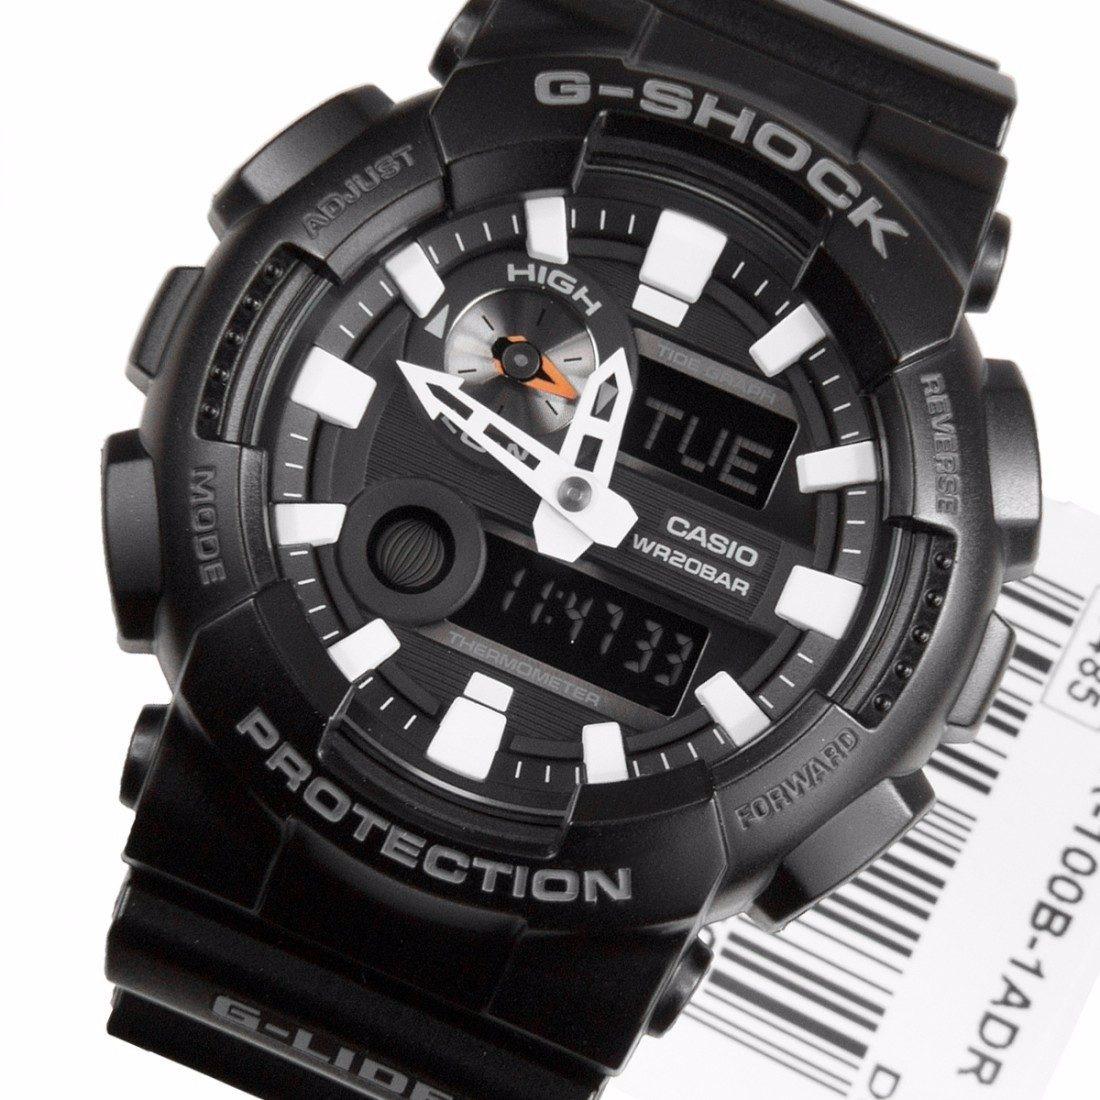 0864db40081 Relógio Casio G-shock Gax-100b-1a Preto Lançamento Gax100 - R  564 ...